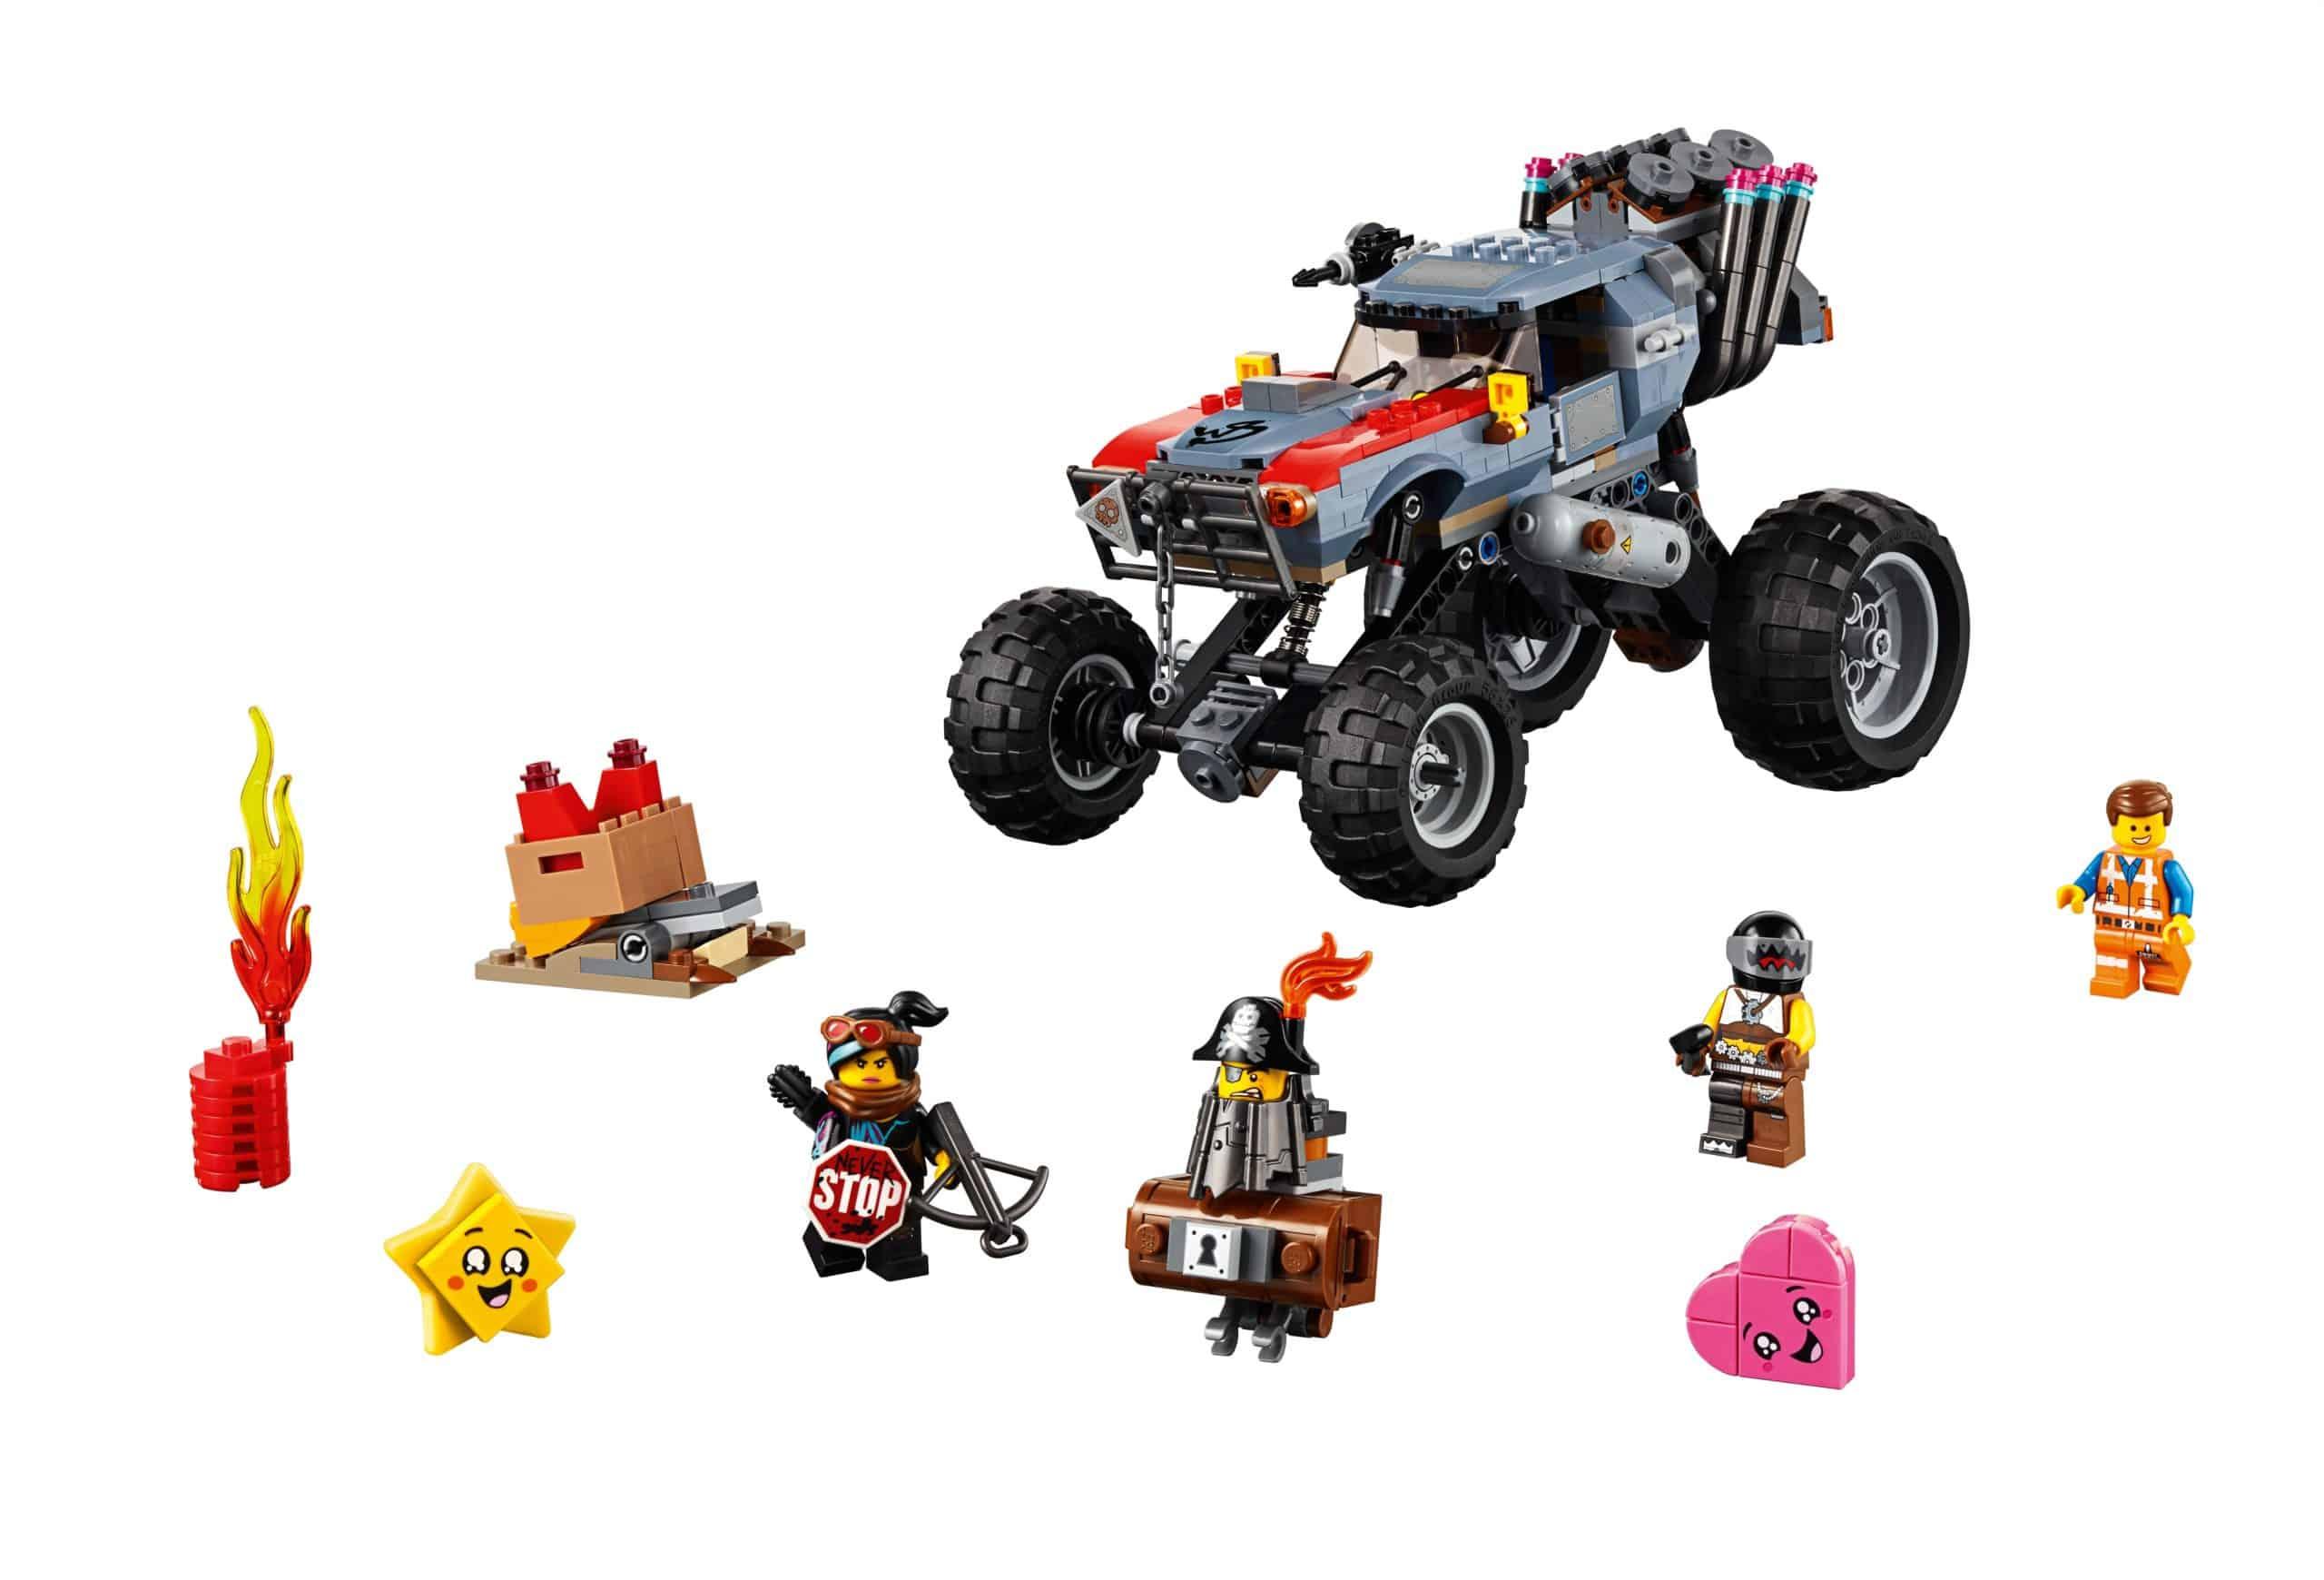 lego emmets en lucys vlucht buggy 70829 scaled